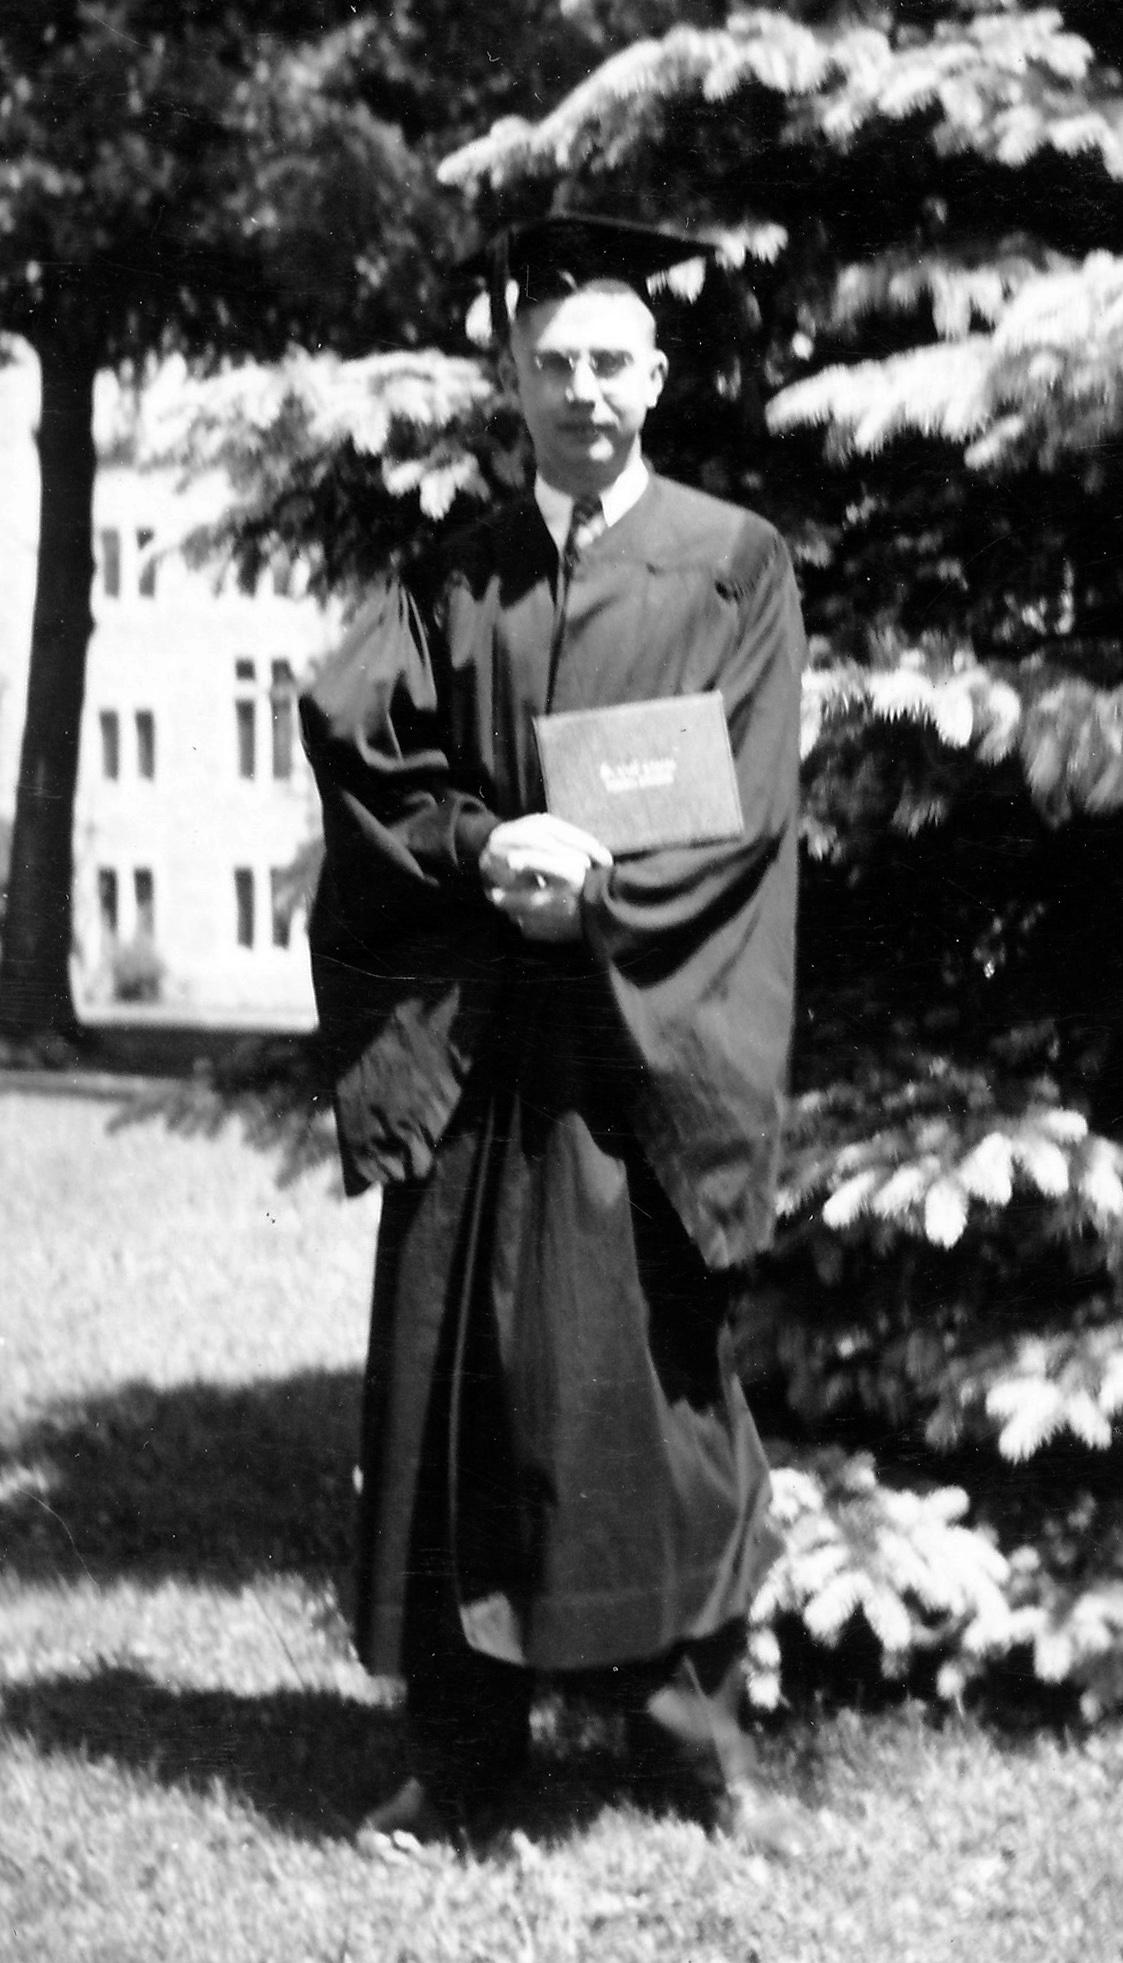 St. Olaf graduation, 1938.